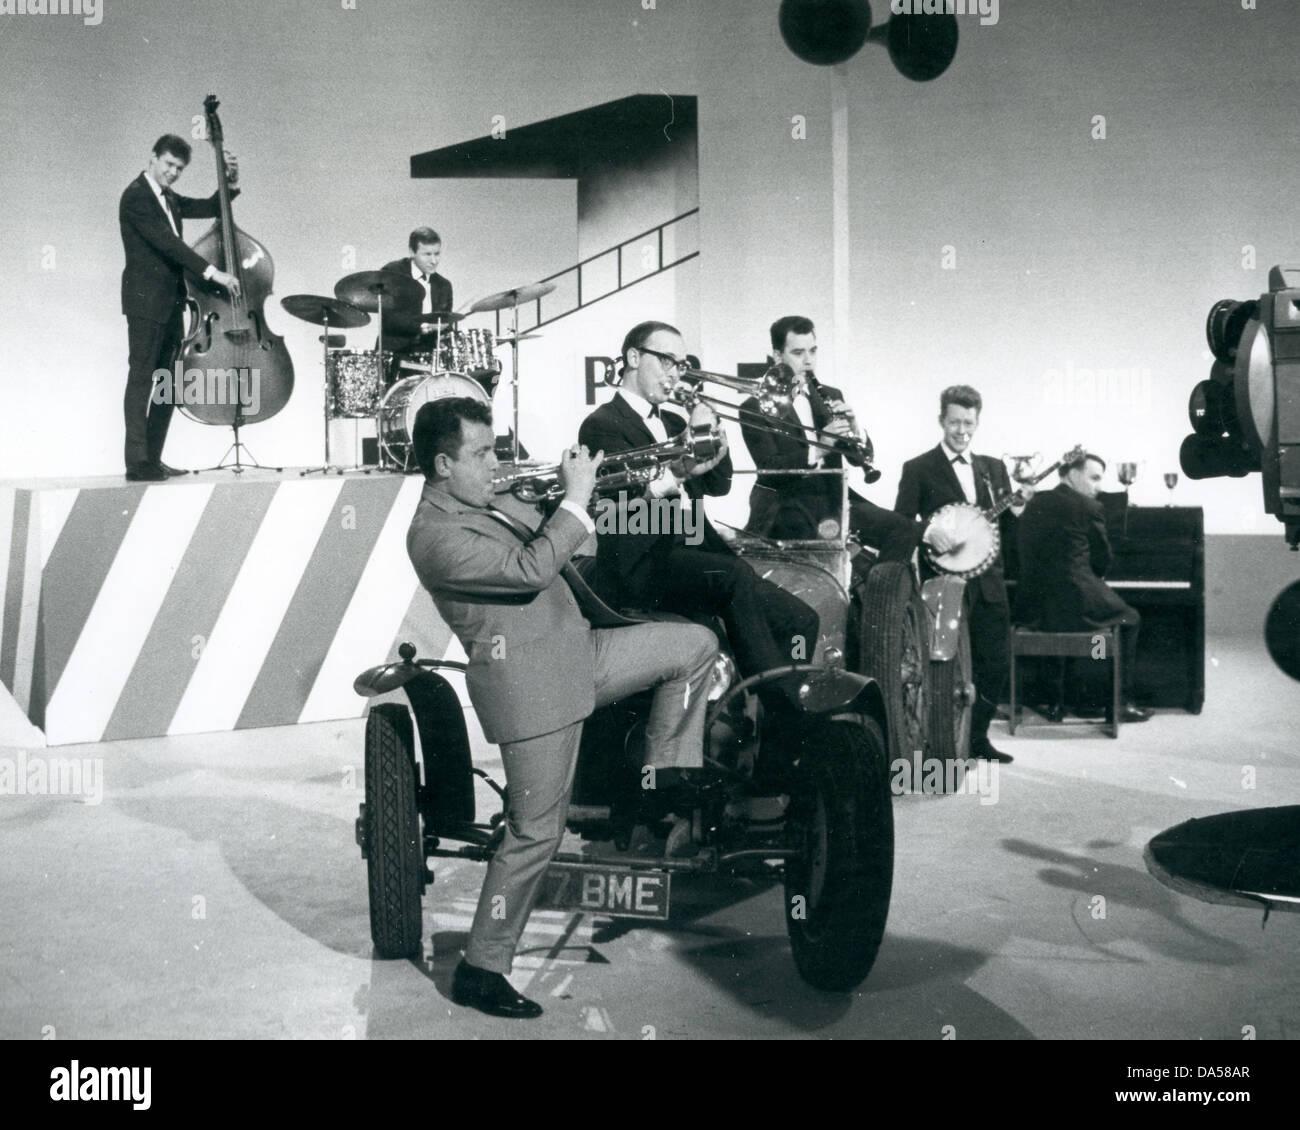 ALAN ELSDON JAZZ BAND  UK group about  1962 - Stock Image